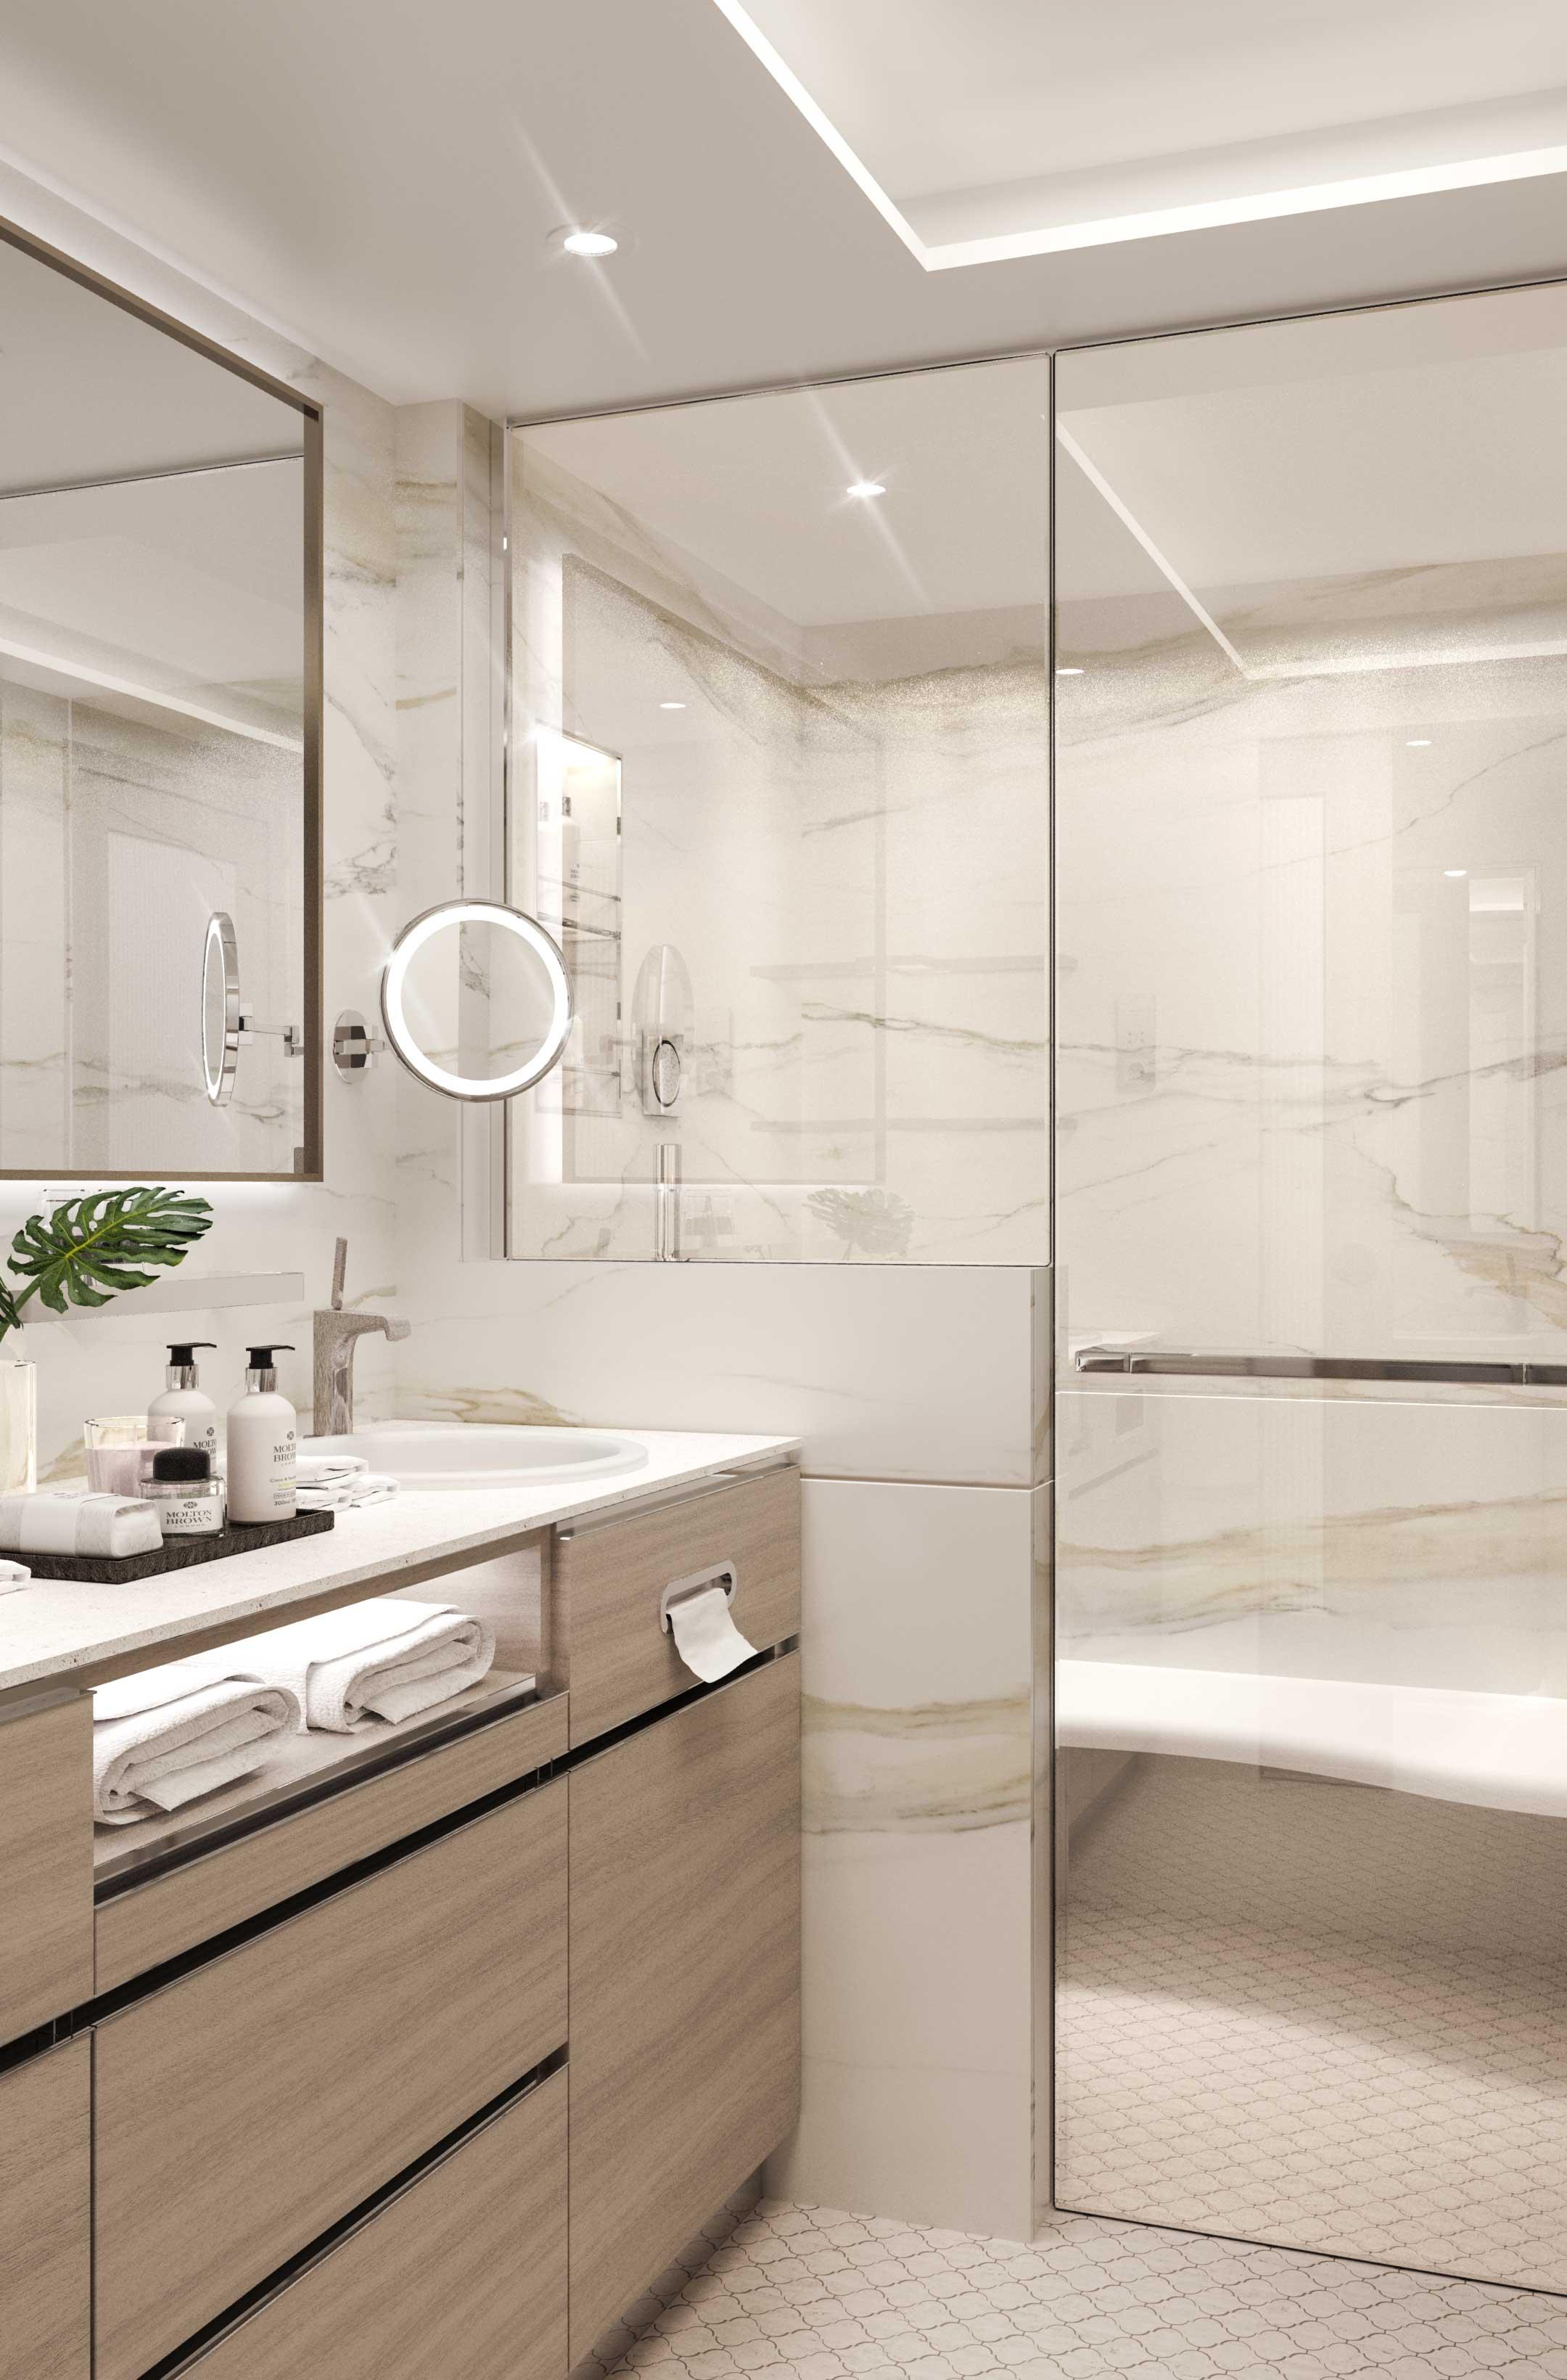 Penthouse Suite mit Veranda PS - Crystal Endeavor - Bild 8 - Thumb